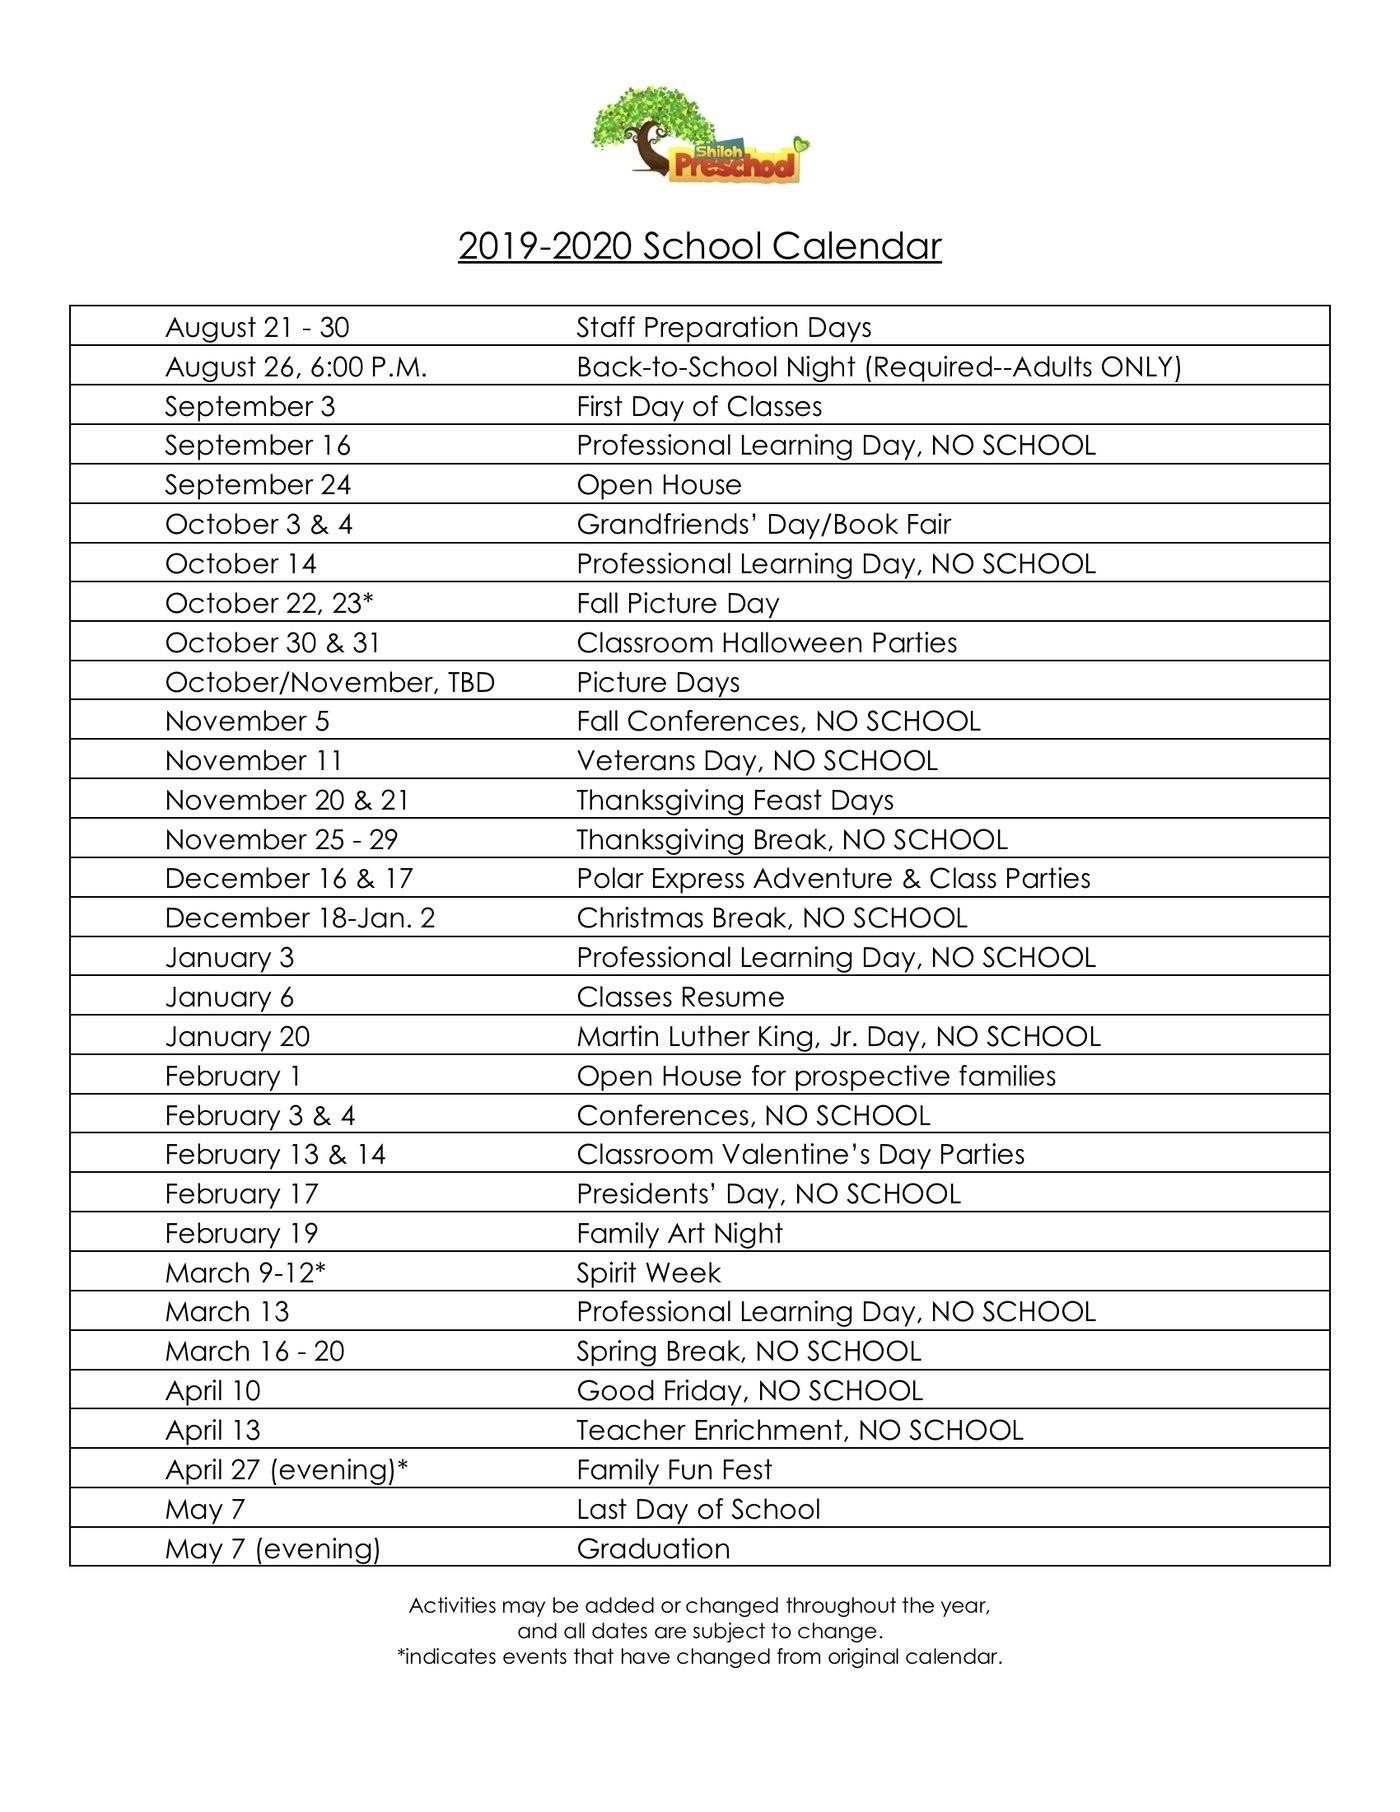 Methodist 2021 Calendar - Template Calendar Design  Ligurthal Calendar 2021 Methodist Episcopal